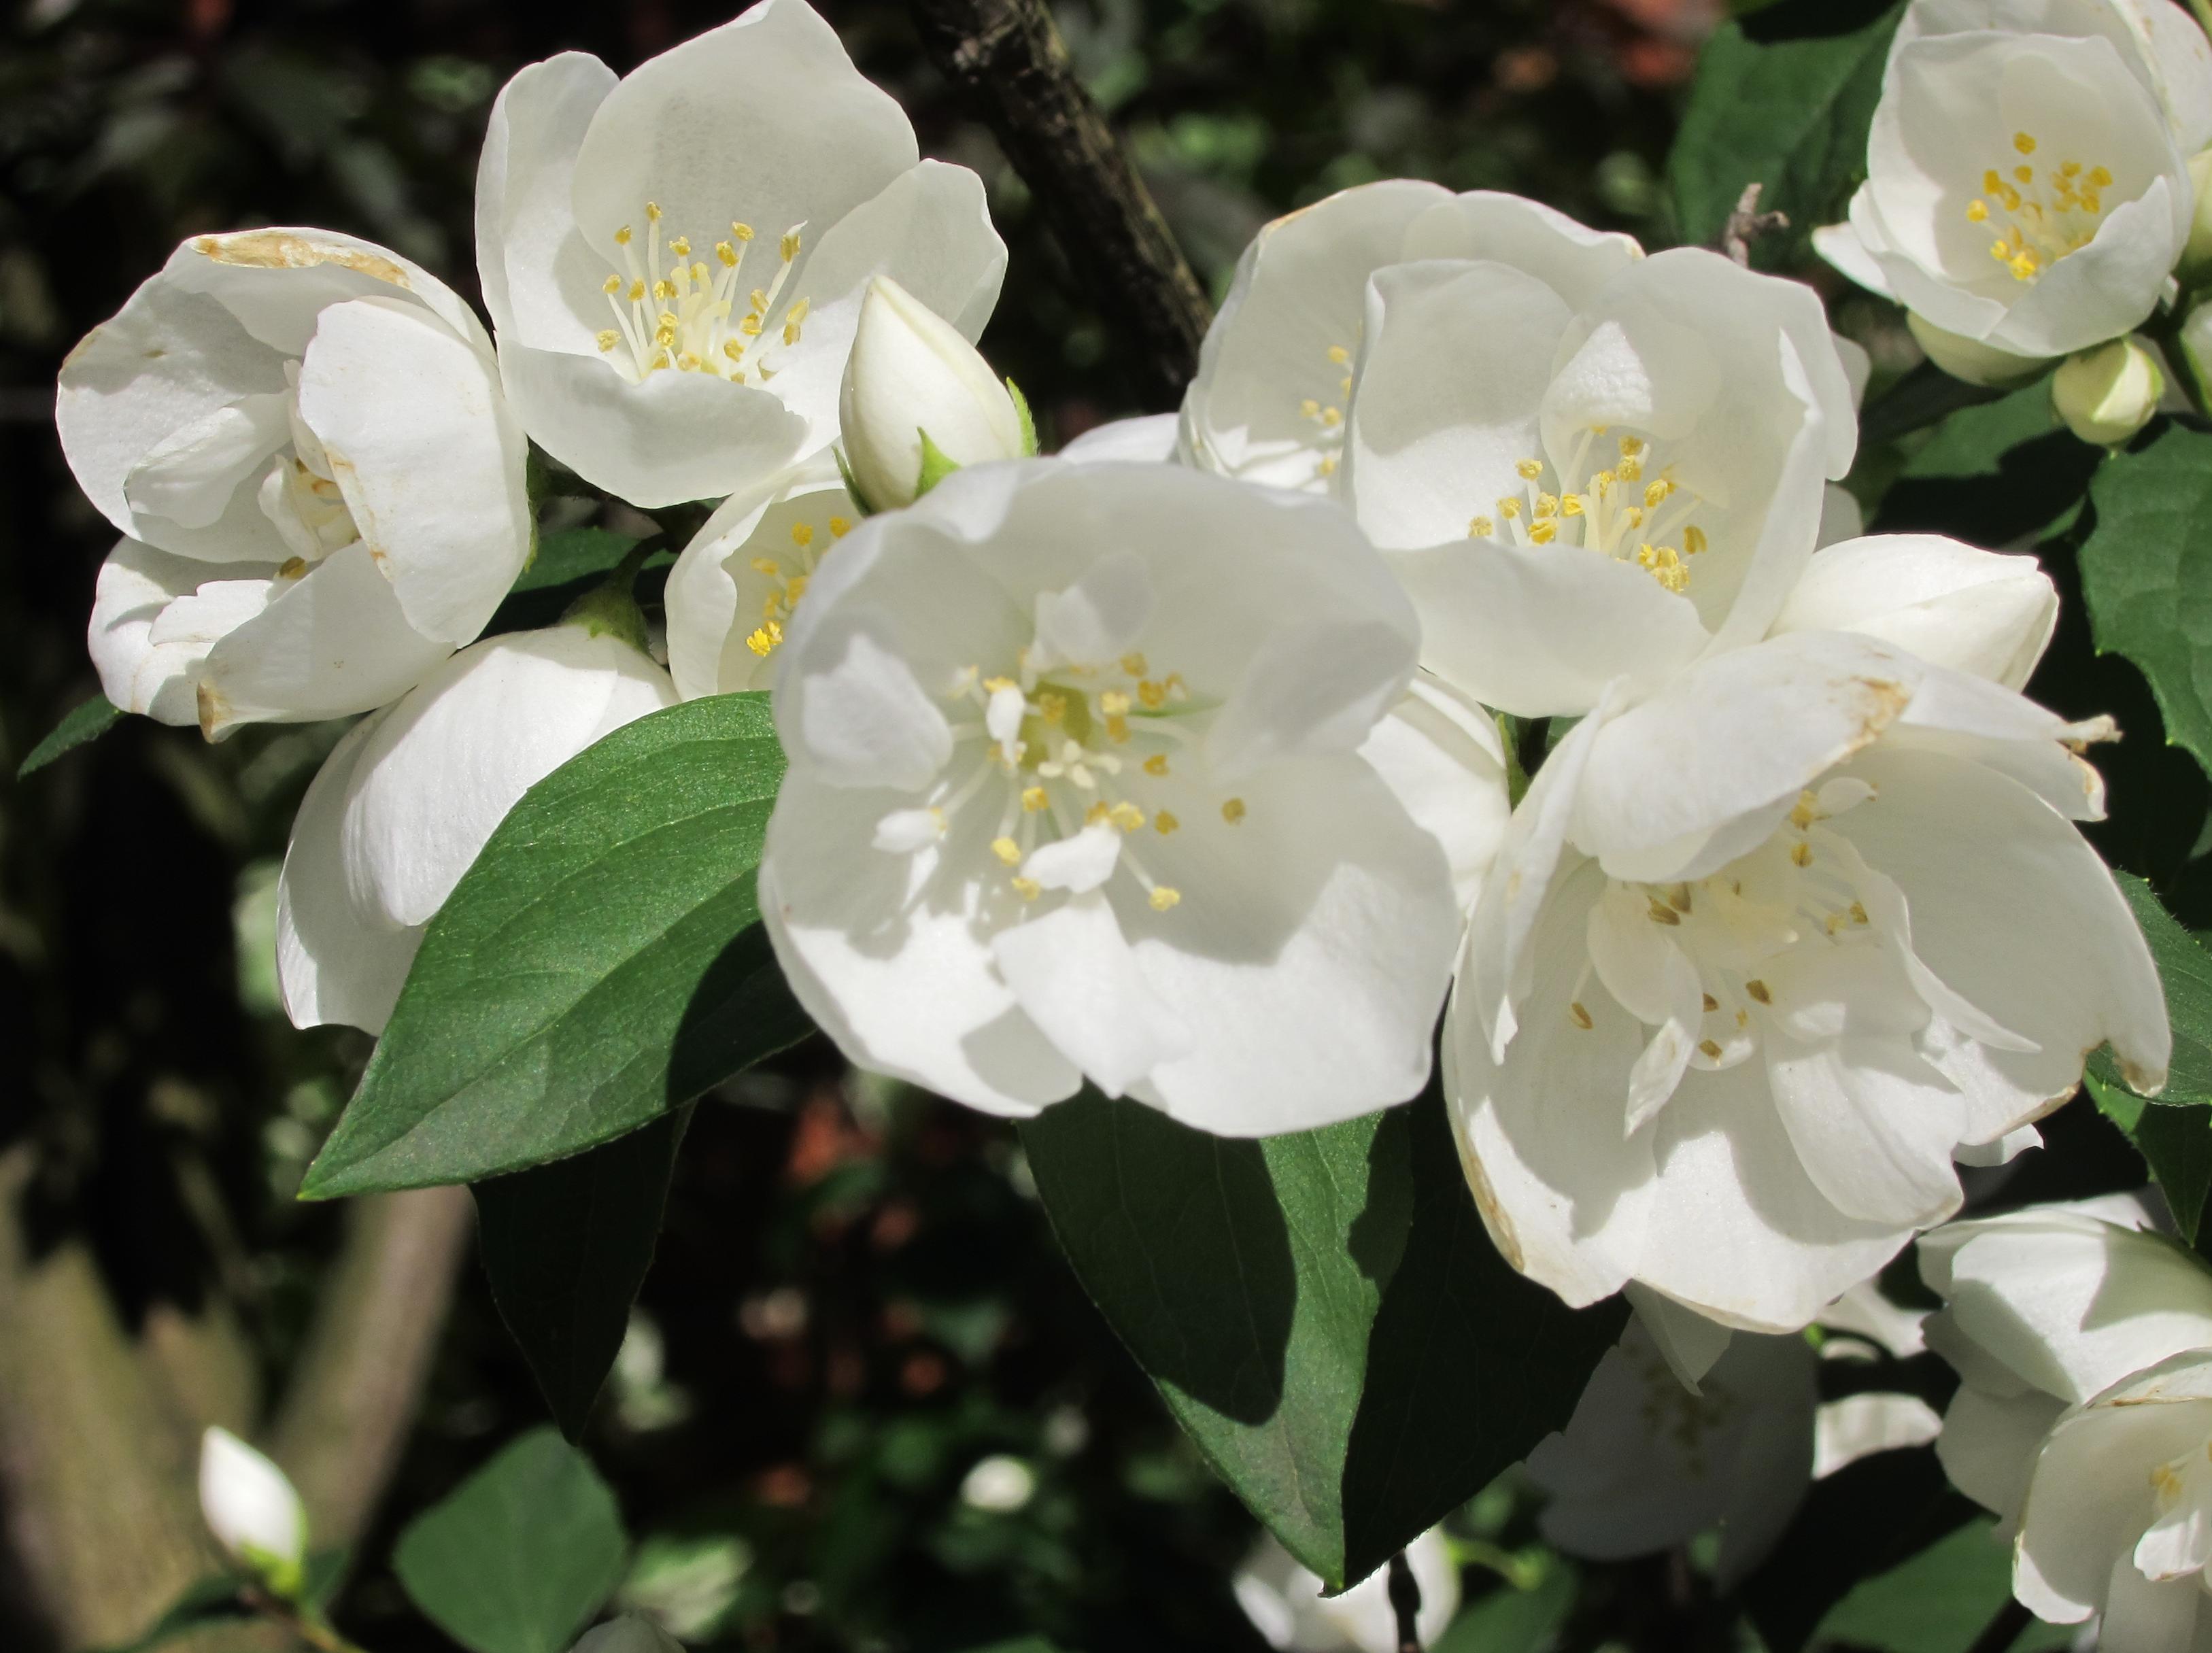 Жасмин нежнейший. Блиц: белые цветы